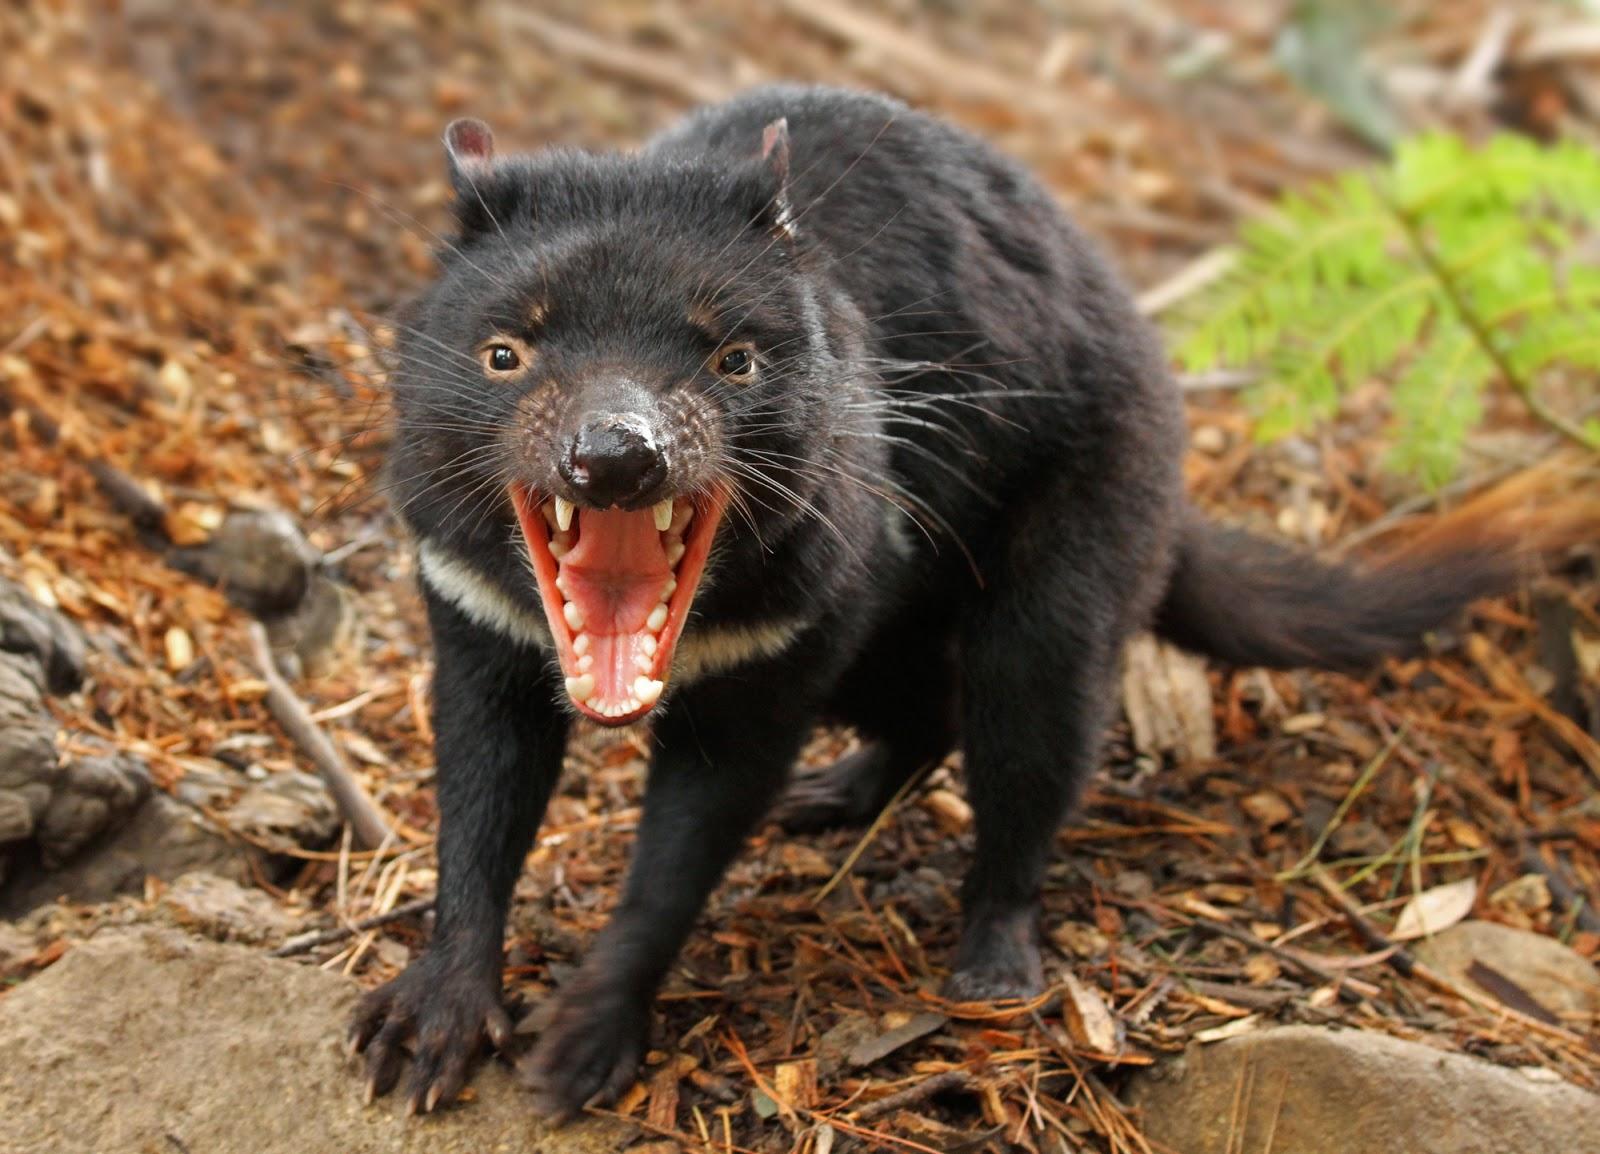 Tasmanian devil interesting facts latest pictures all wildlife photographs - Tasmanian devil pics ...